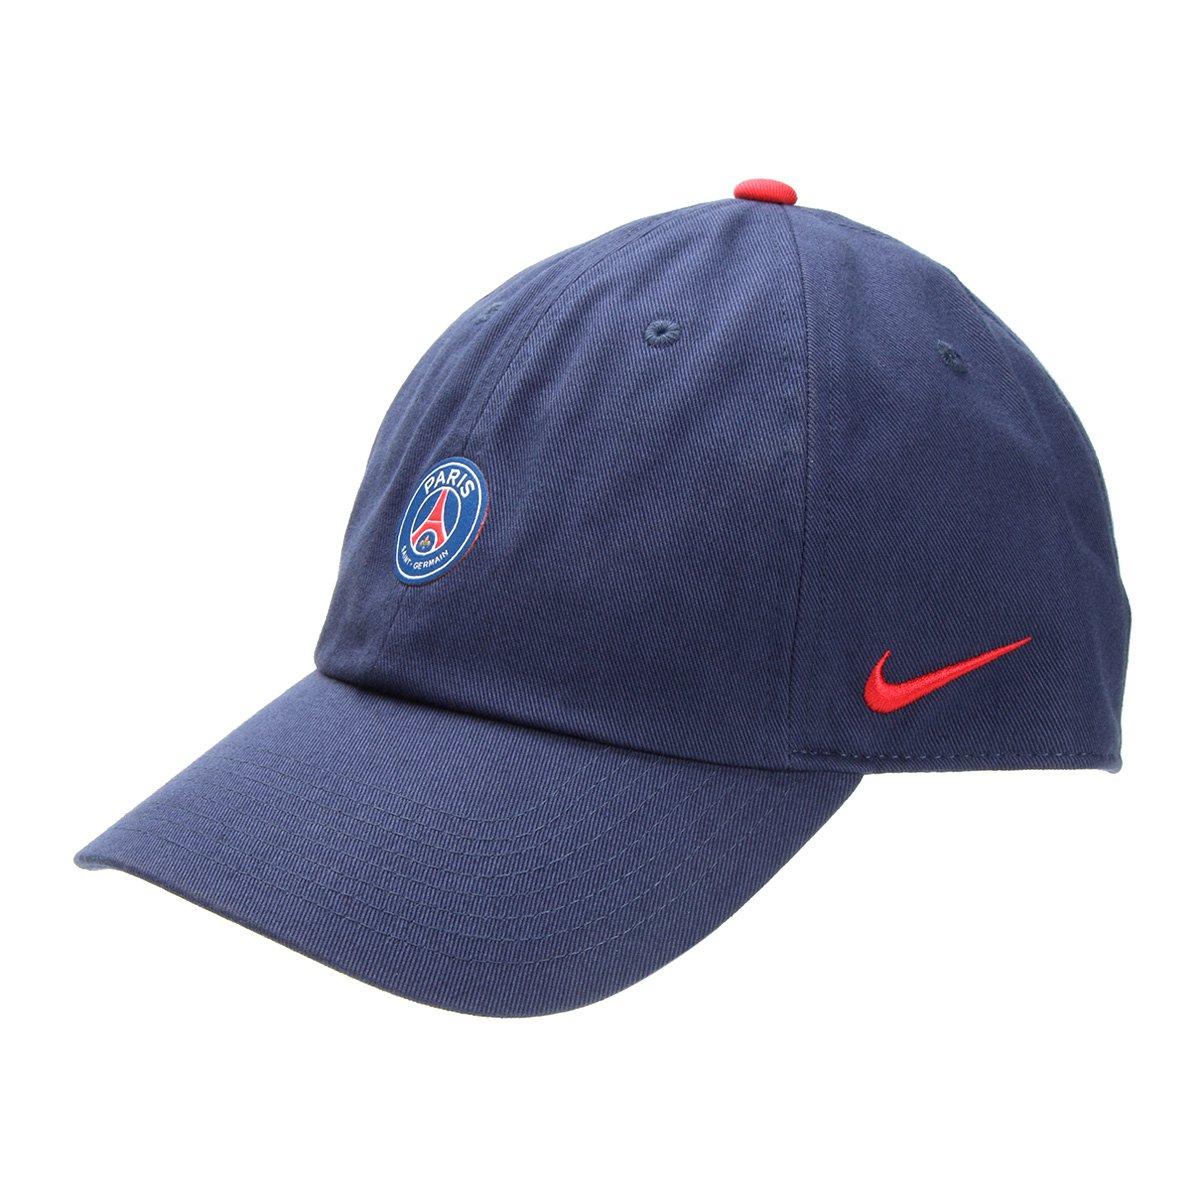 Boné Paris Saint Germain Nike Aba Curva - Compre Agora  a6b0c27c854